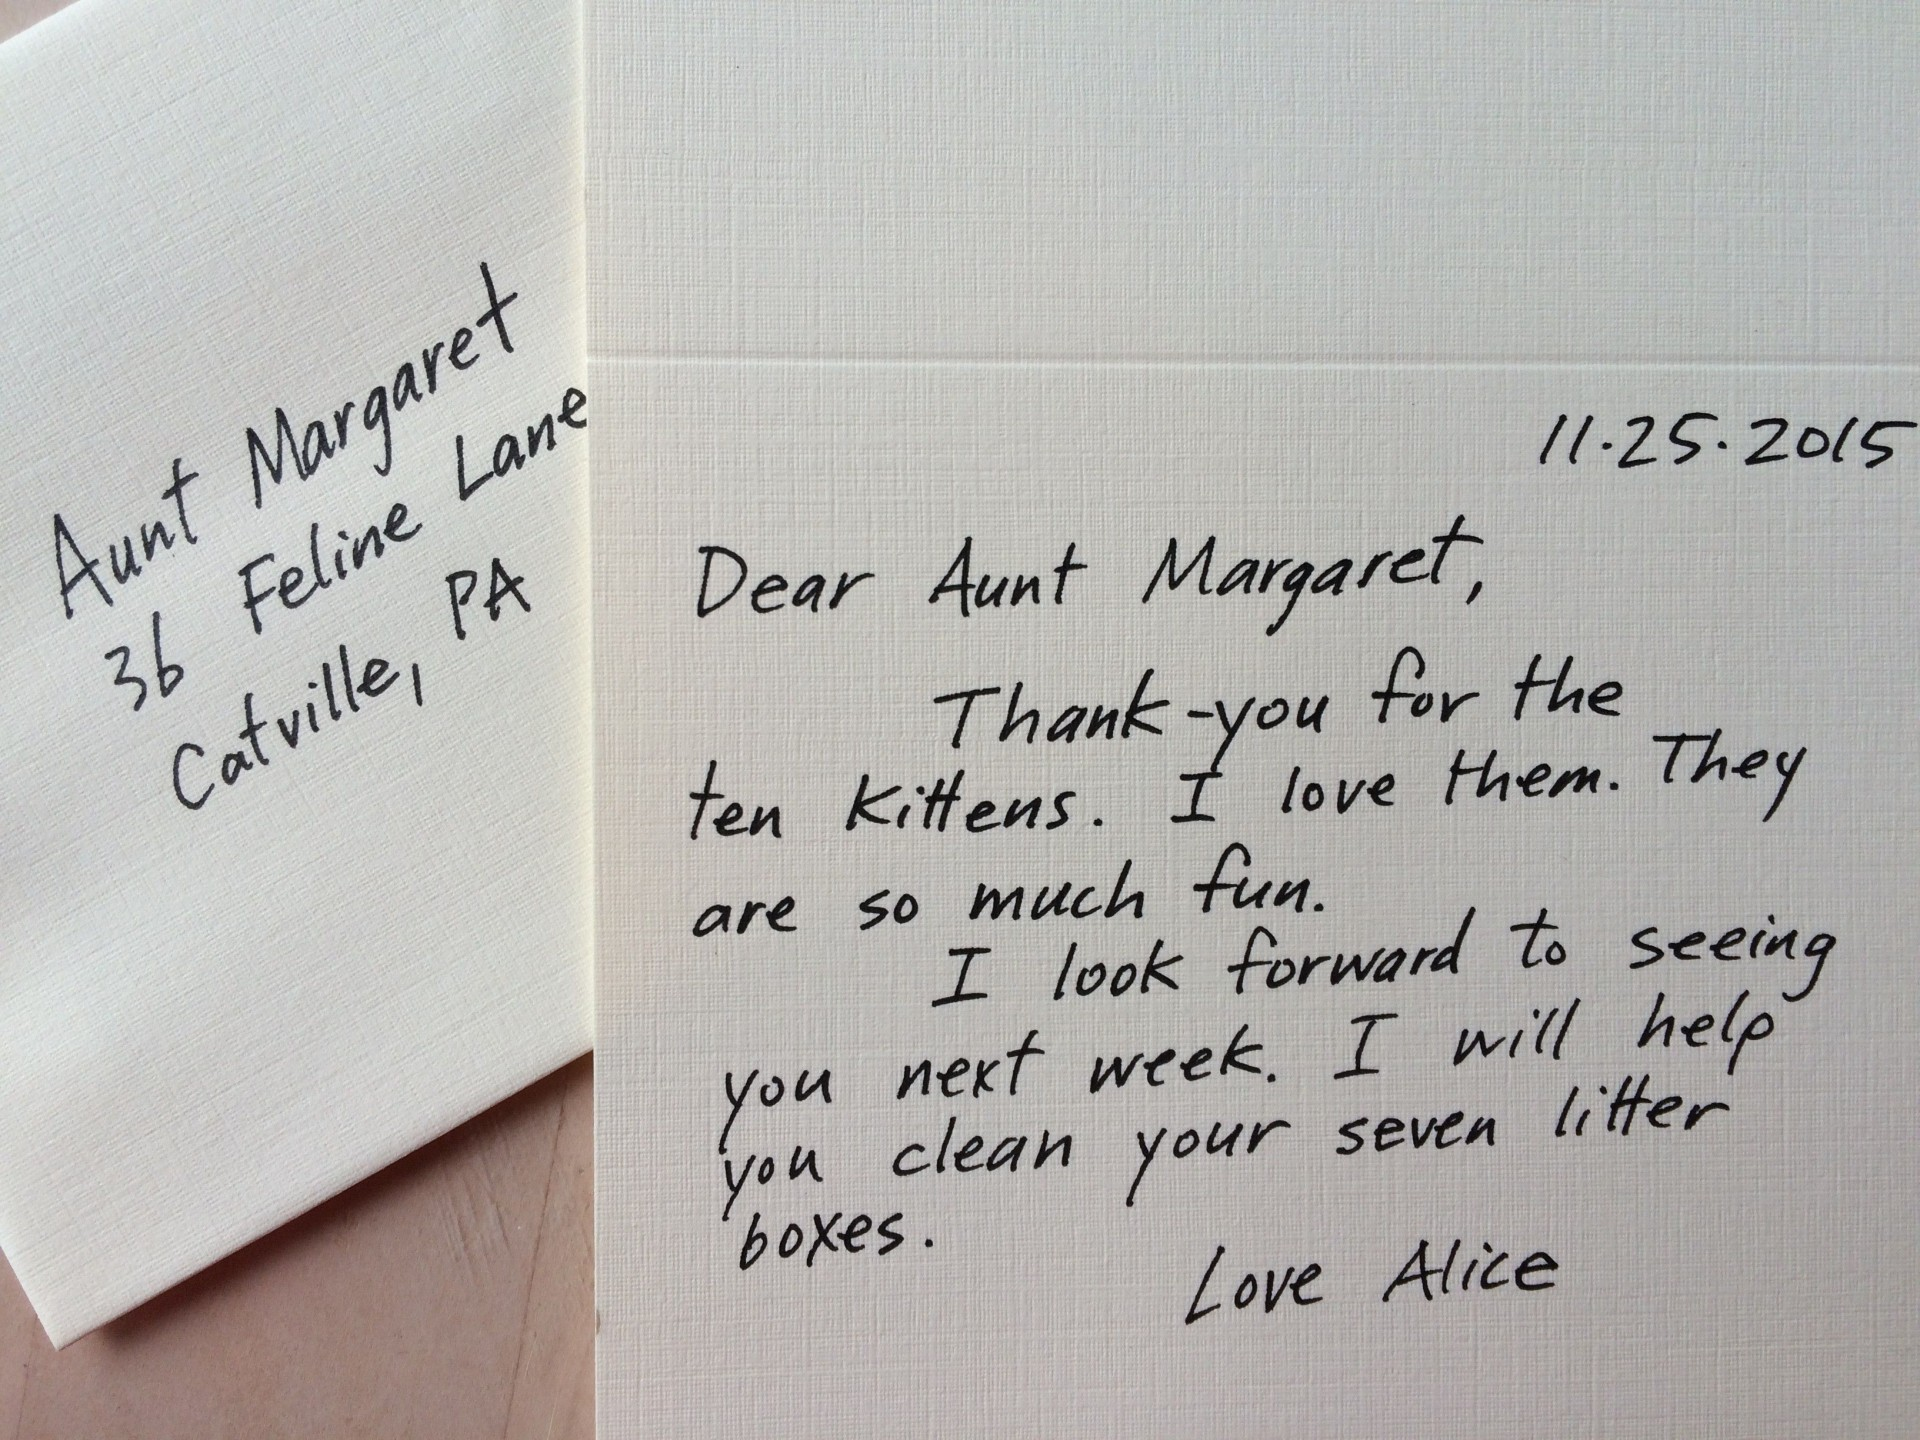 002 Stupendou Handwritten Thank You Note After Interview Template High Def 1920